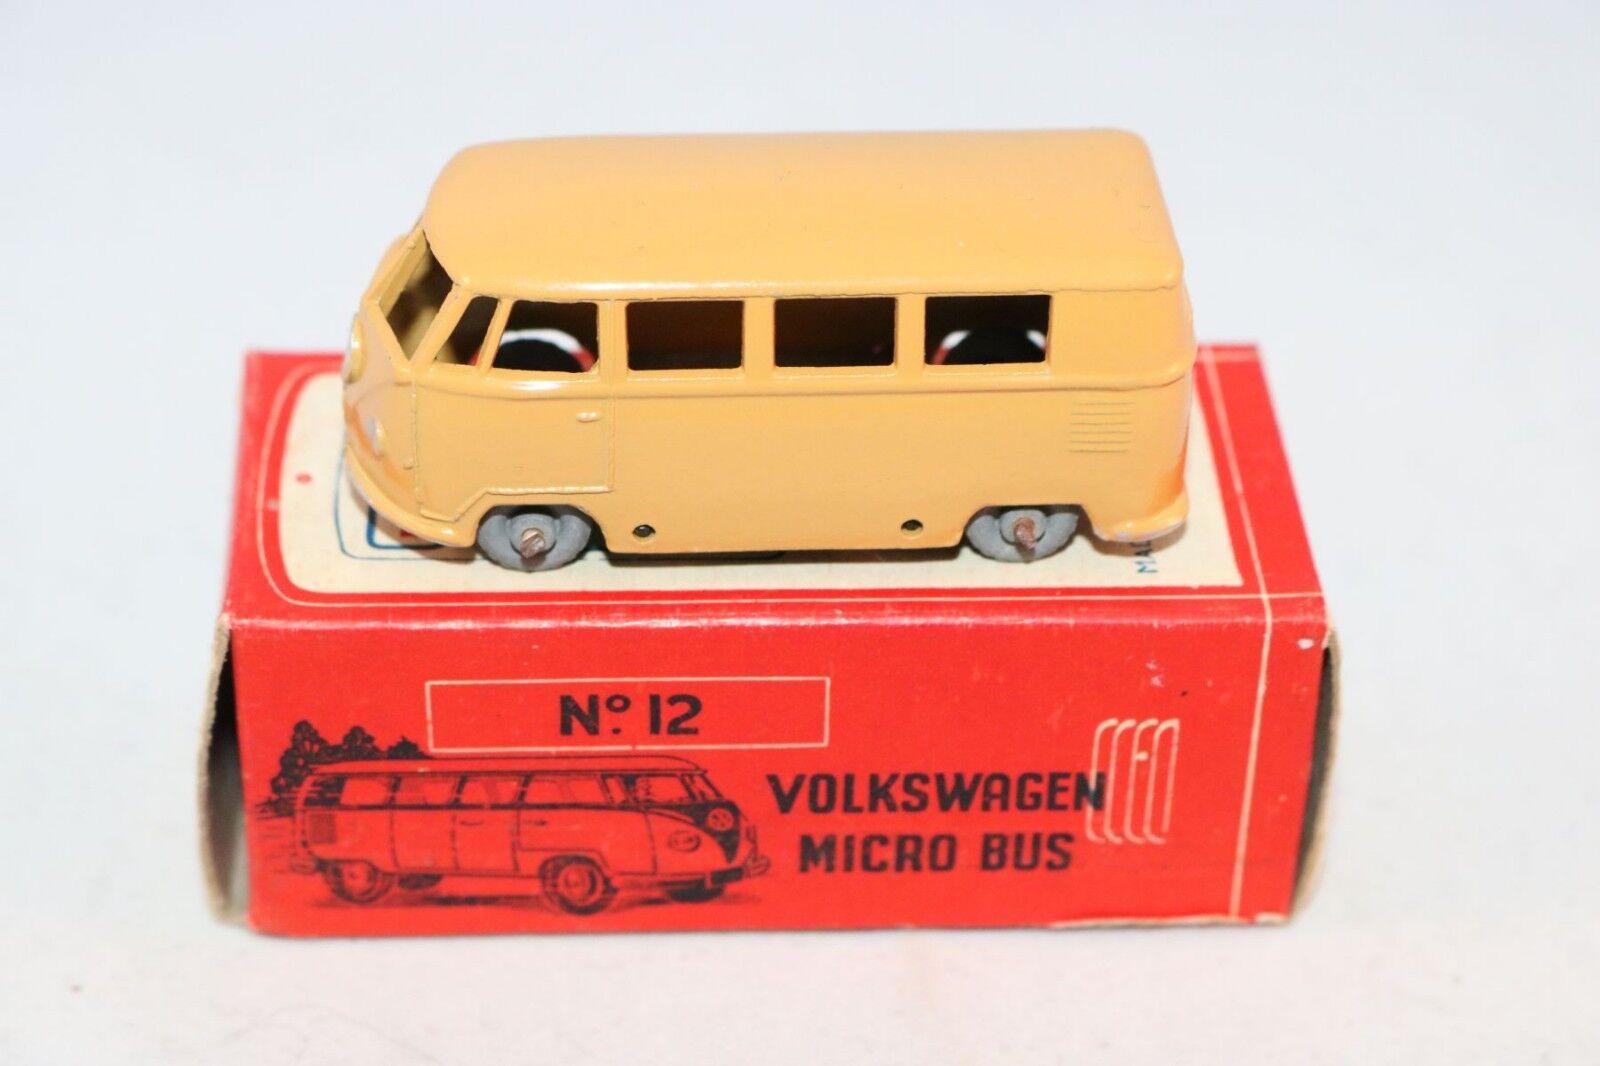 Morestone 12 Budgie Budgie Budgie ESSO Petrol Pump series Volkswagen Micro Bus mint in box 76e5d4